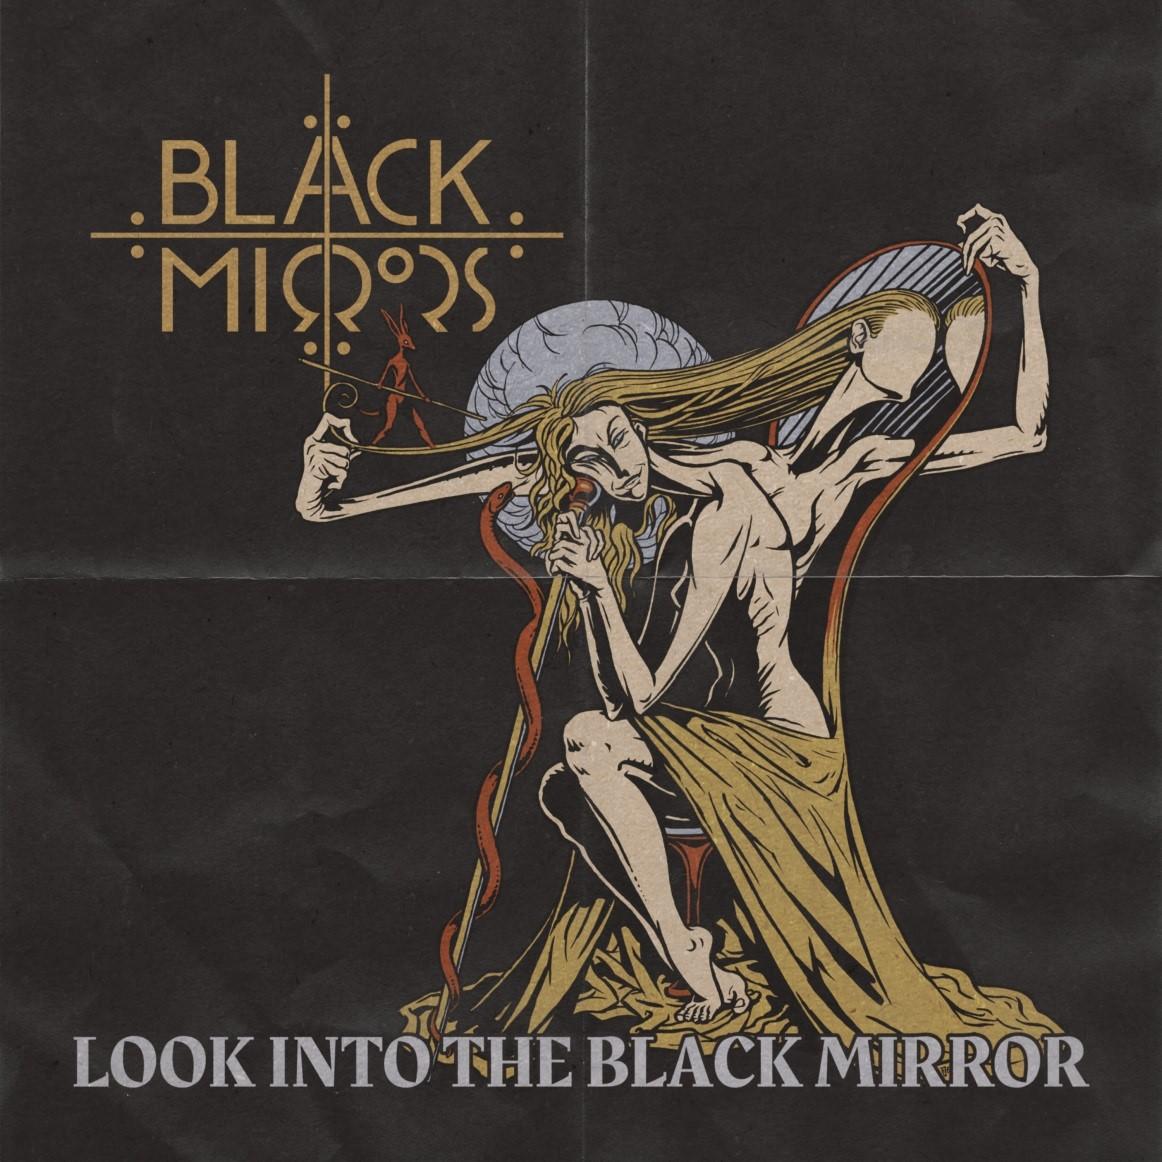 BlackMirrorsAlbum.jpg